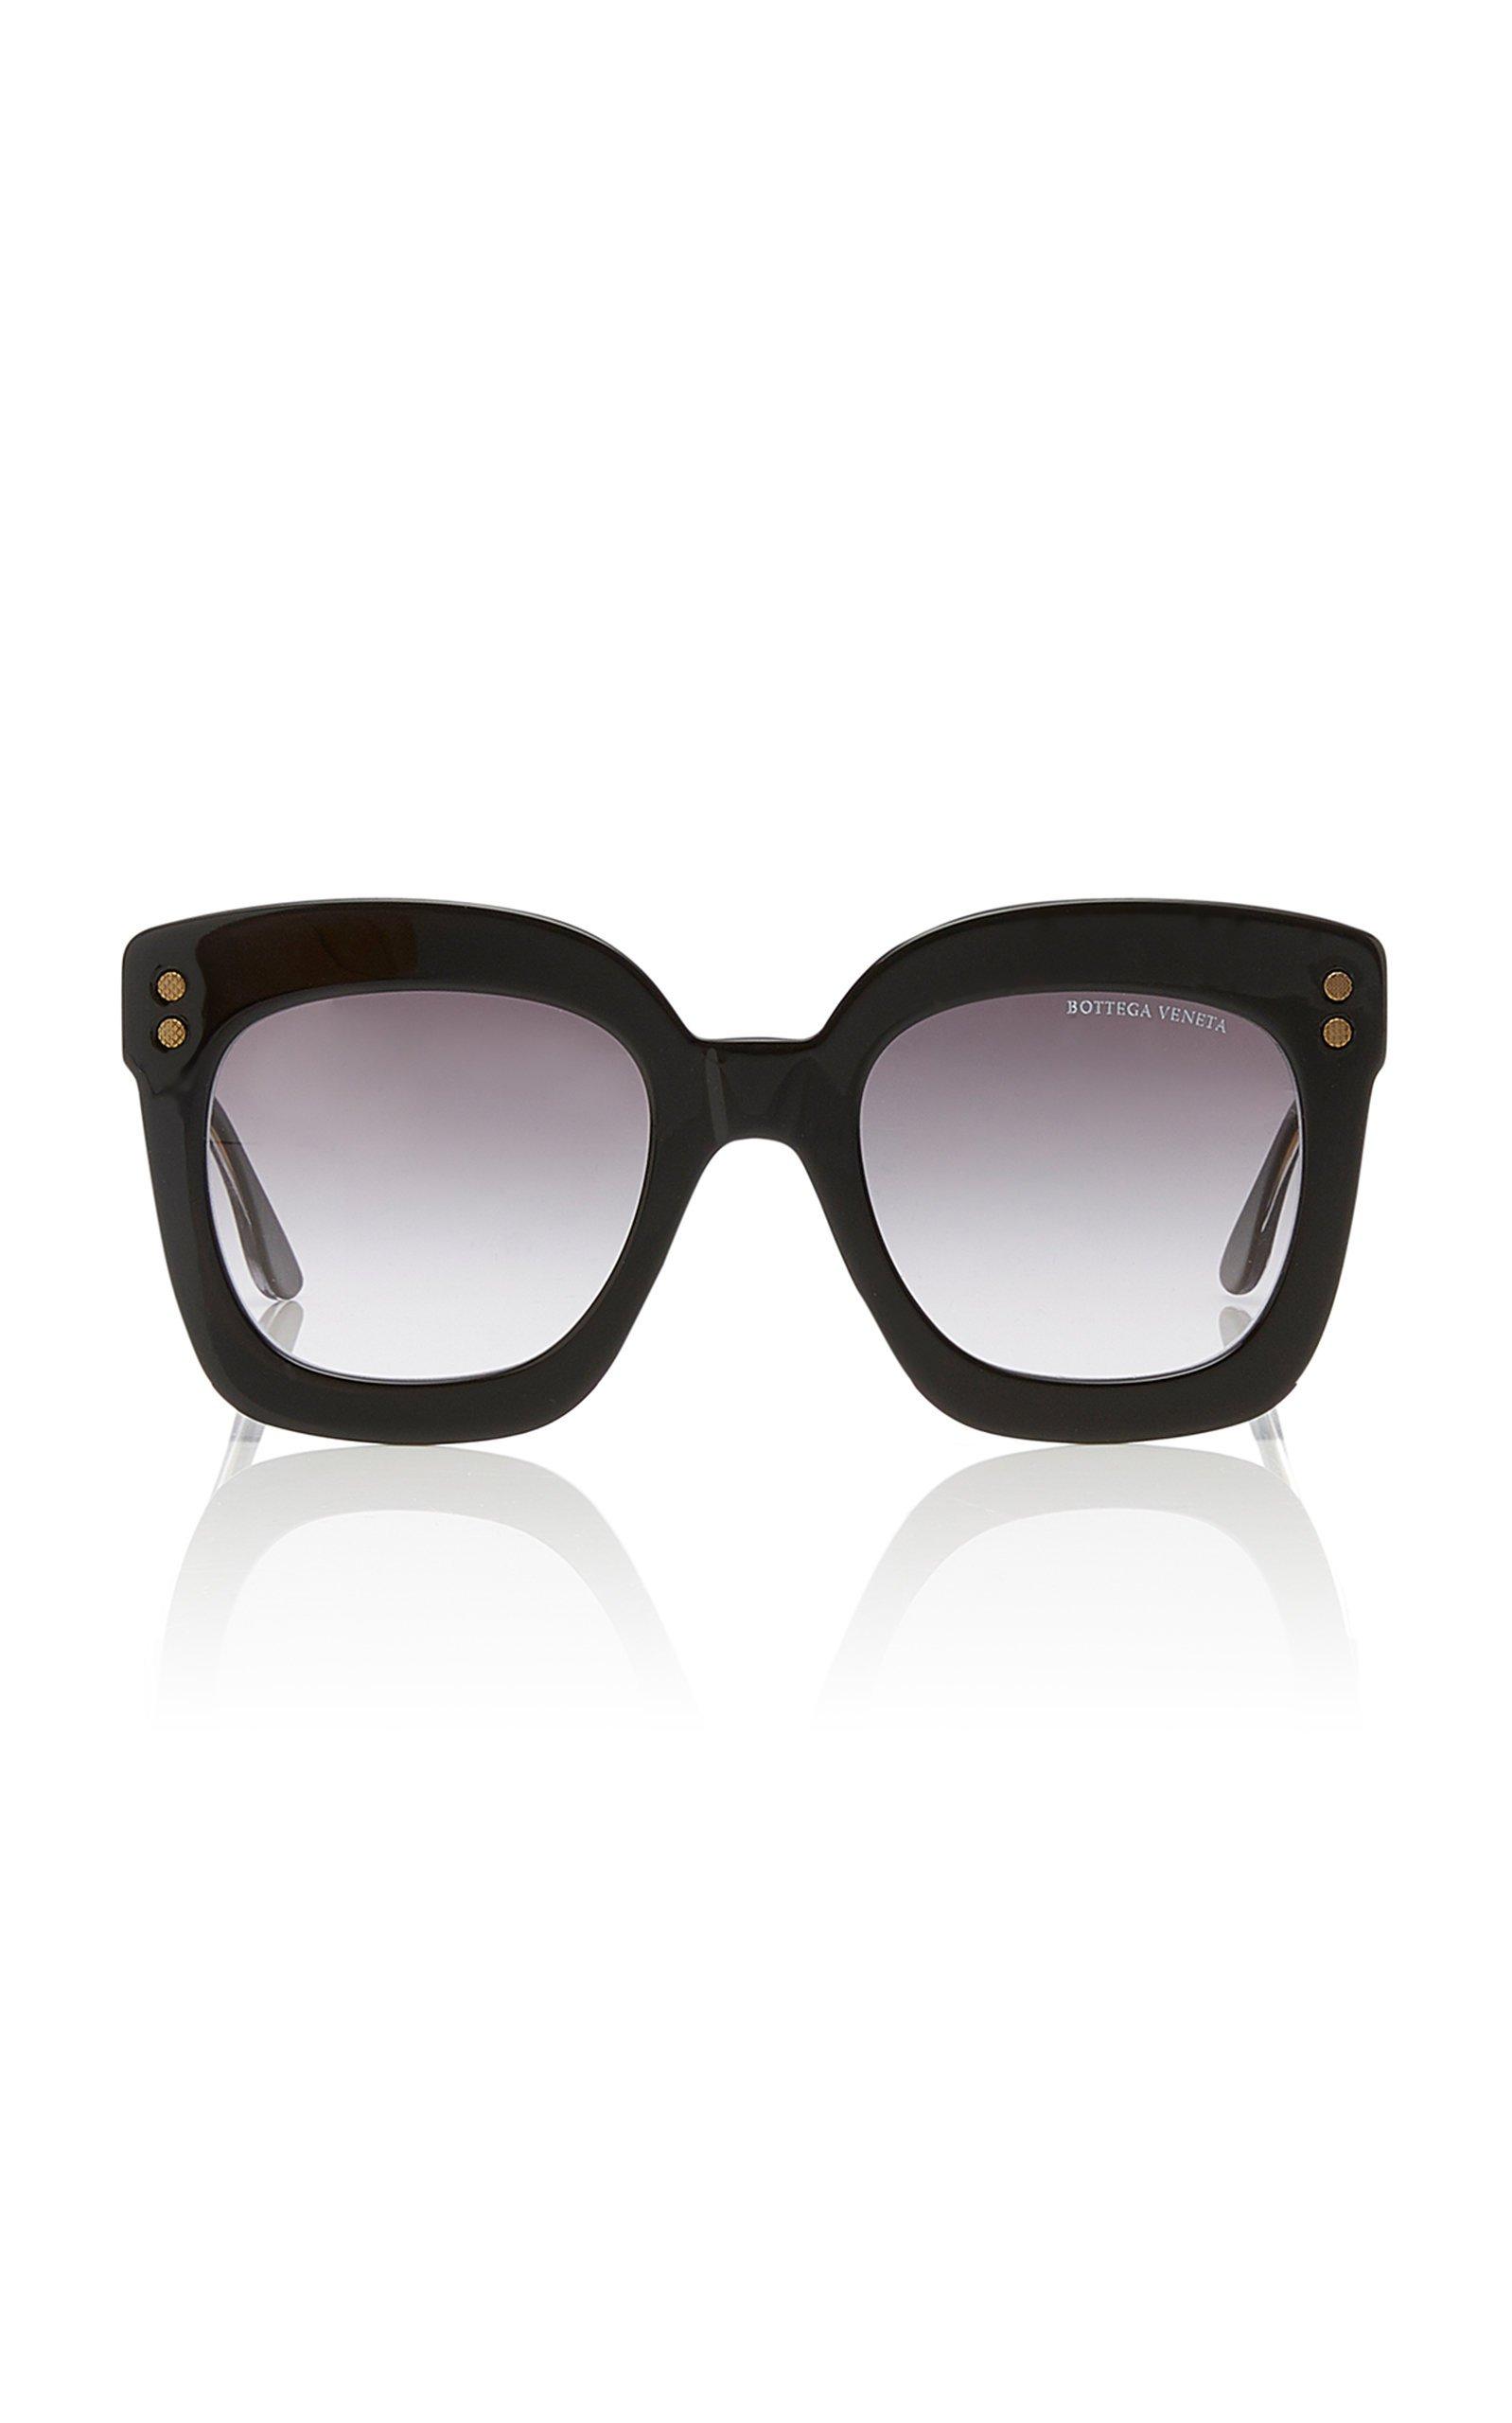 Bottega Veneta Sunglasses Oversized Square-Frame Acetate Sunglasses